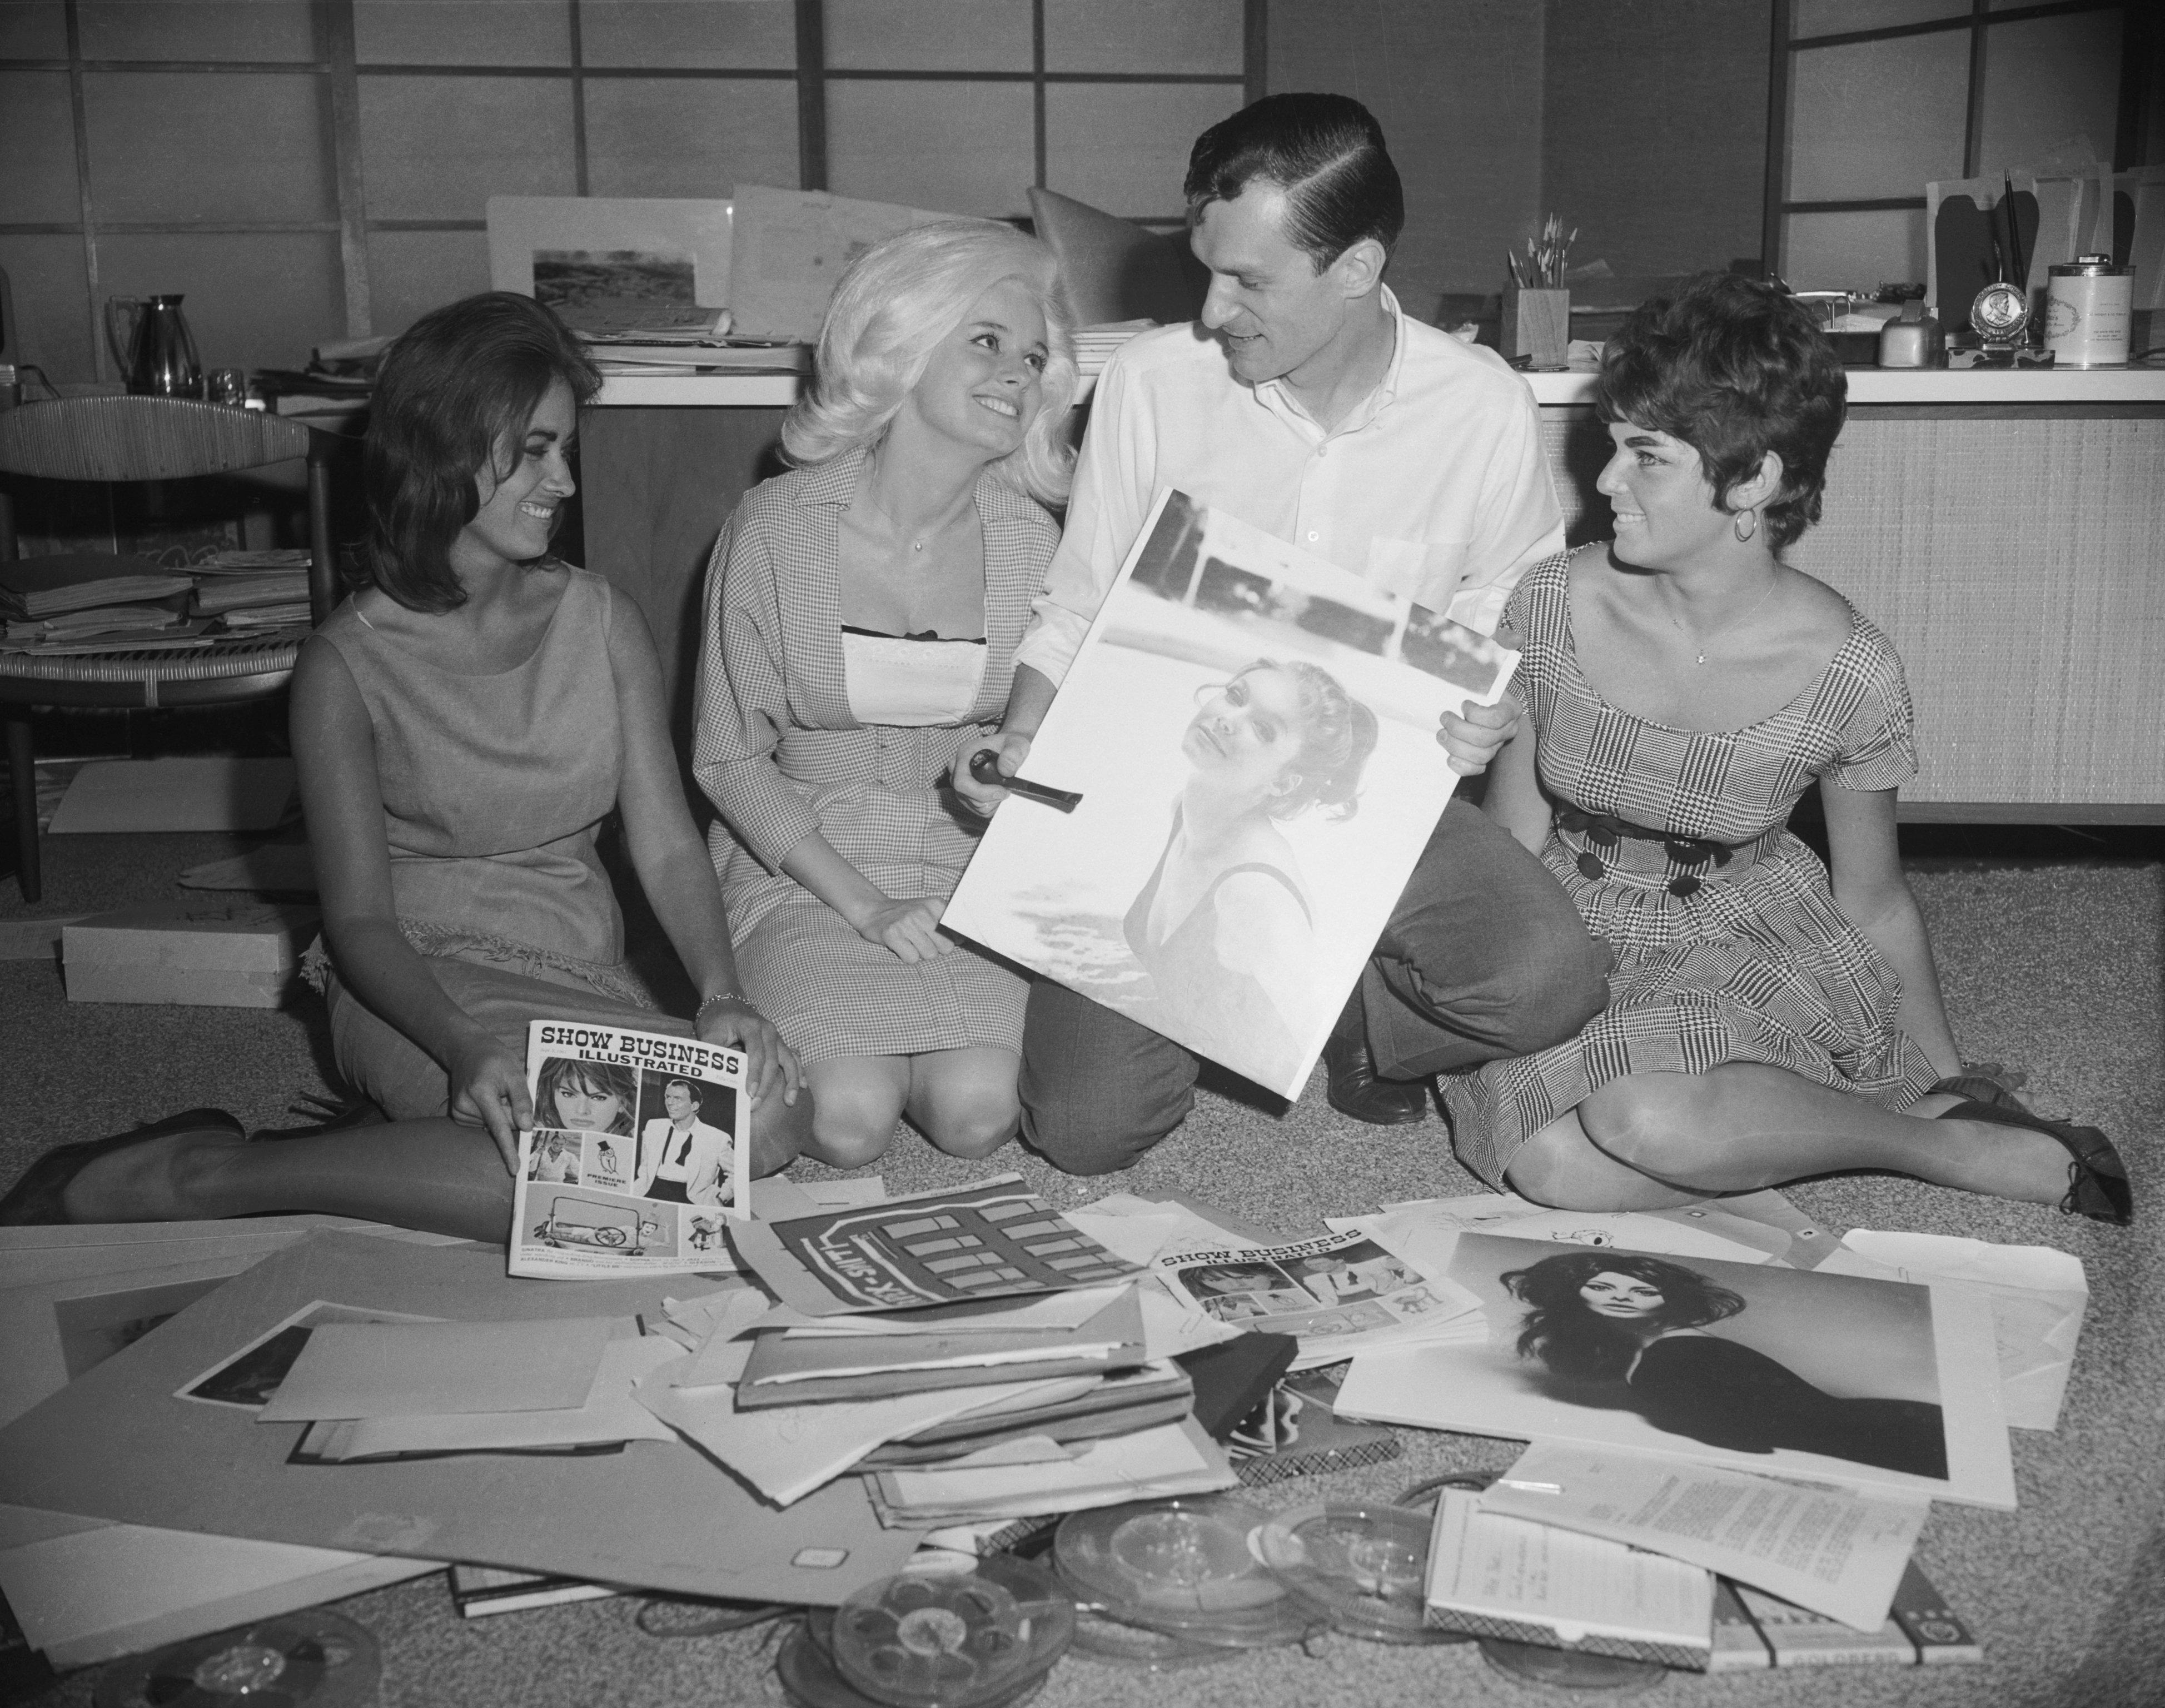 Stunning! Hugh Hefner's Playboy Reinforced The Idea That Great Literature Is A Male Interest